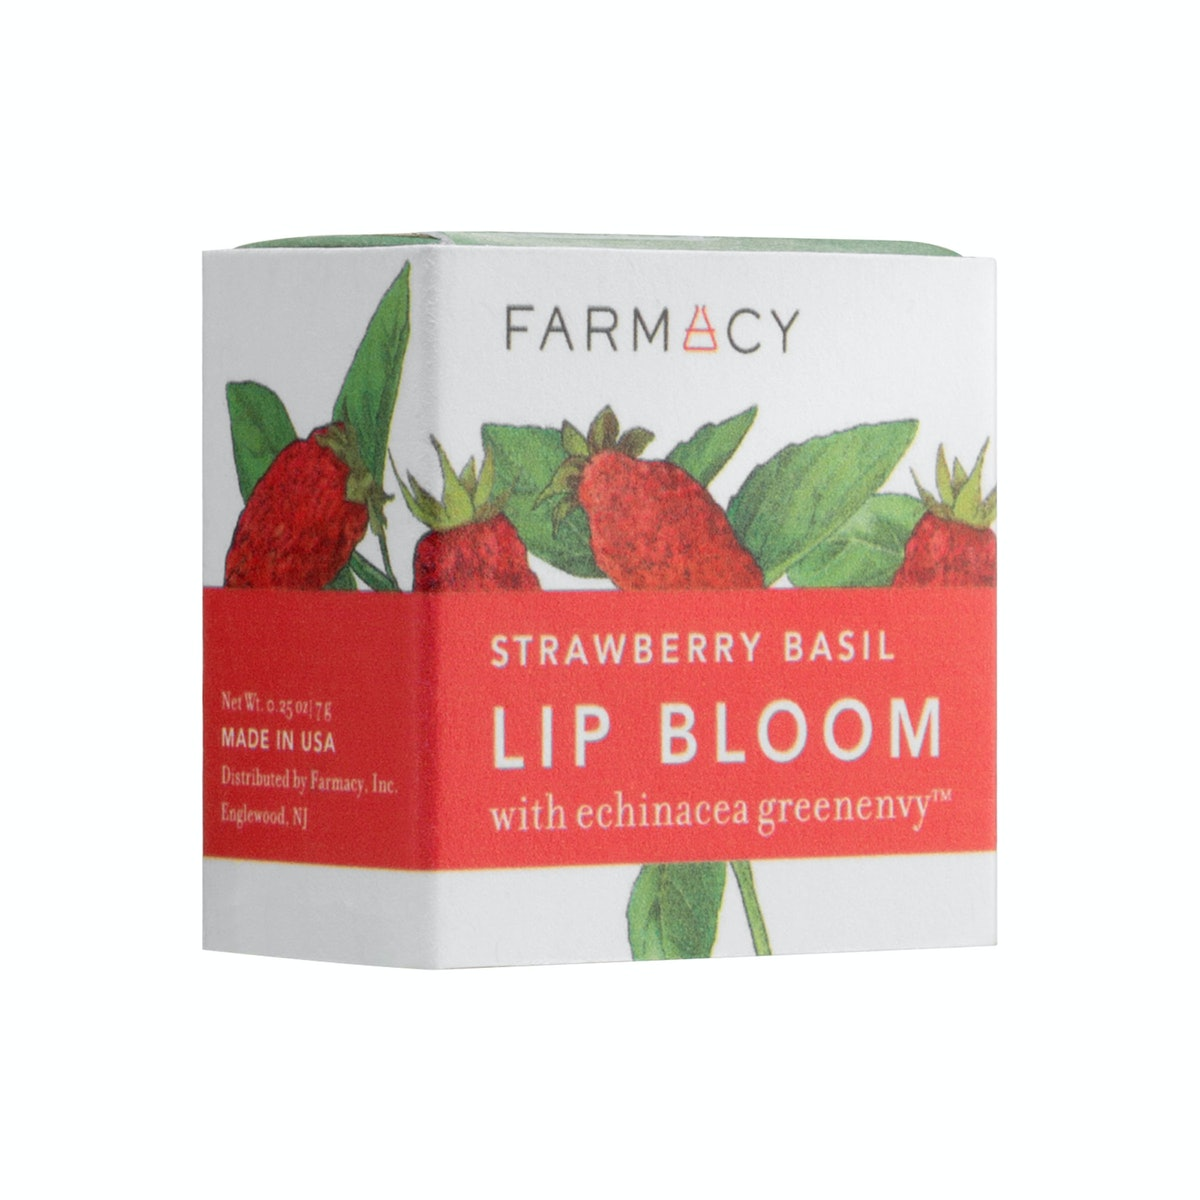 Farmacy Strawberry Basil Lip Balm